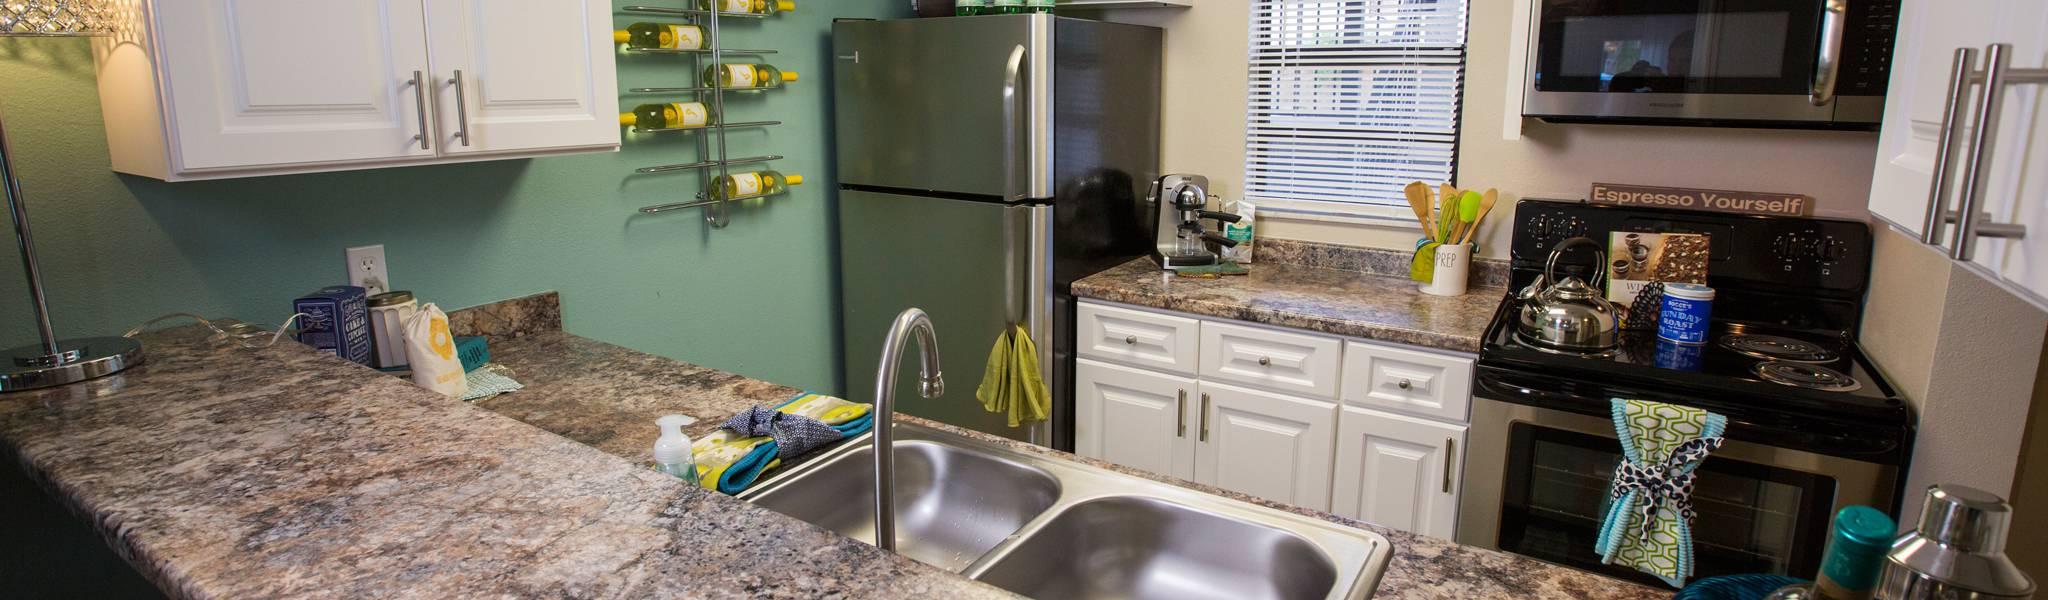 apartments in orlando fl for rent aspen square management